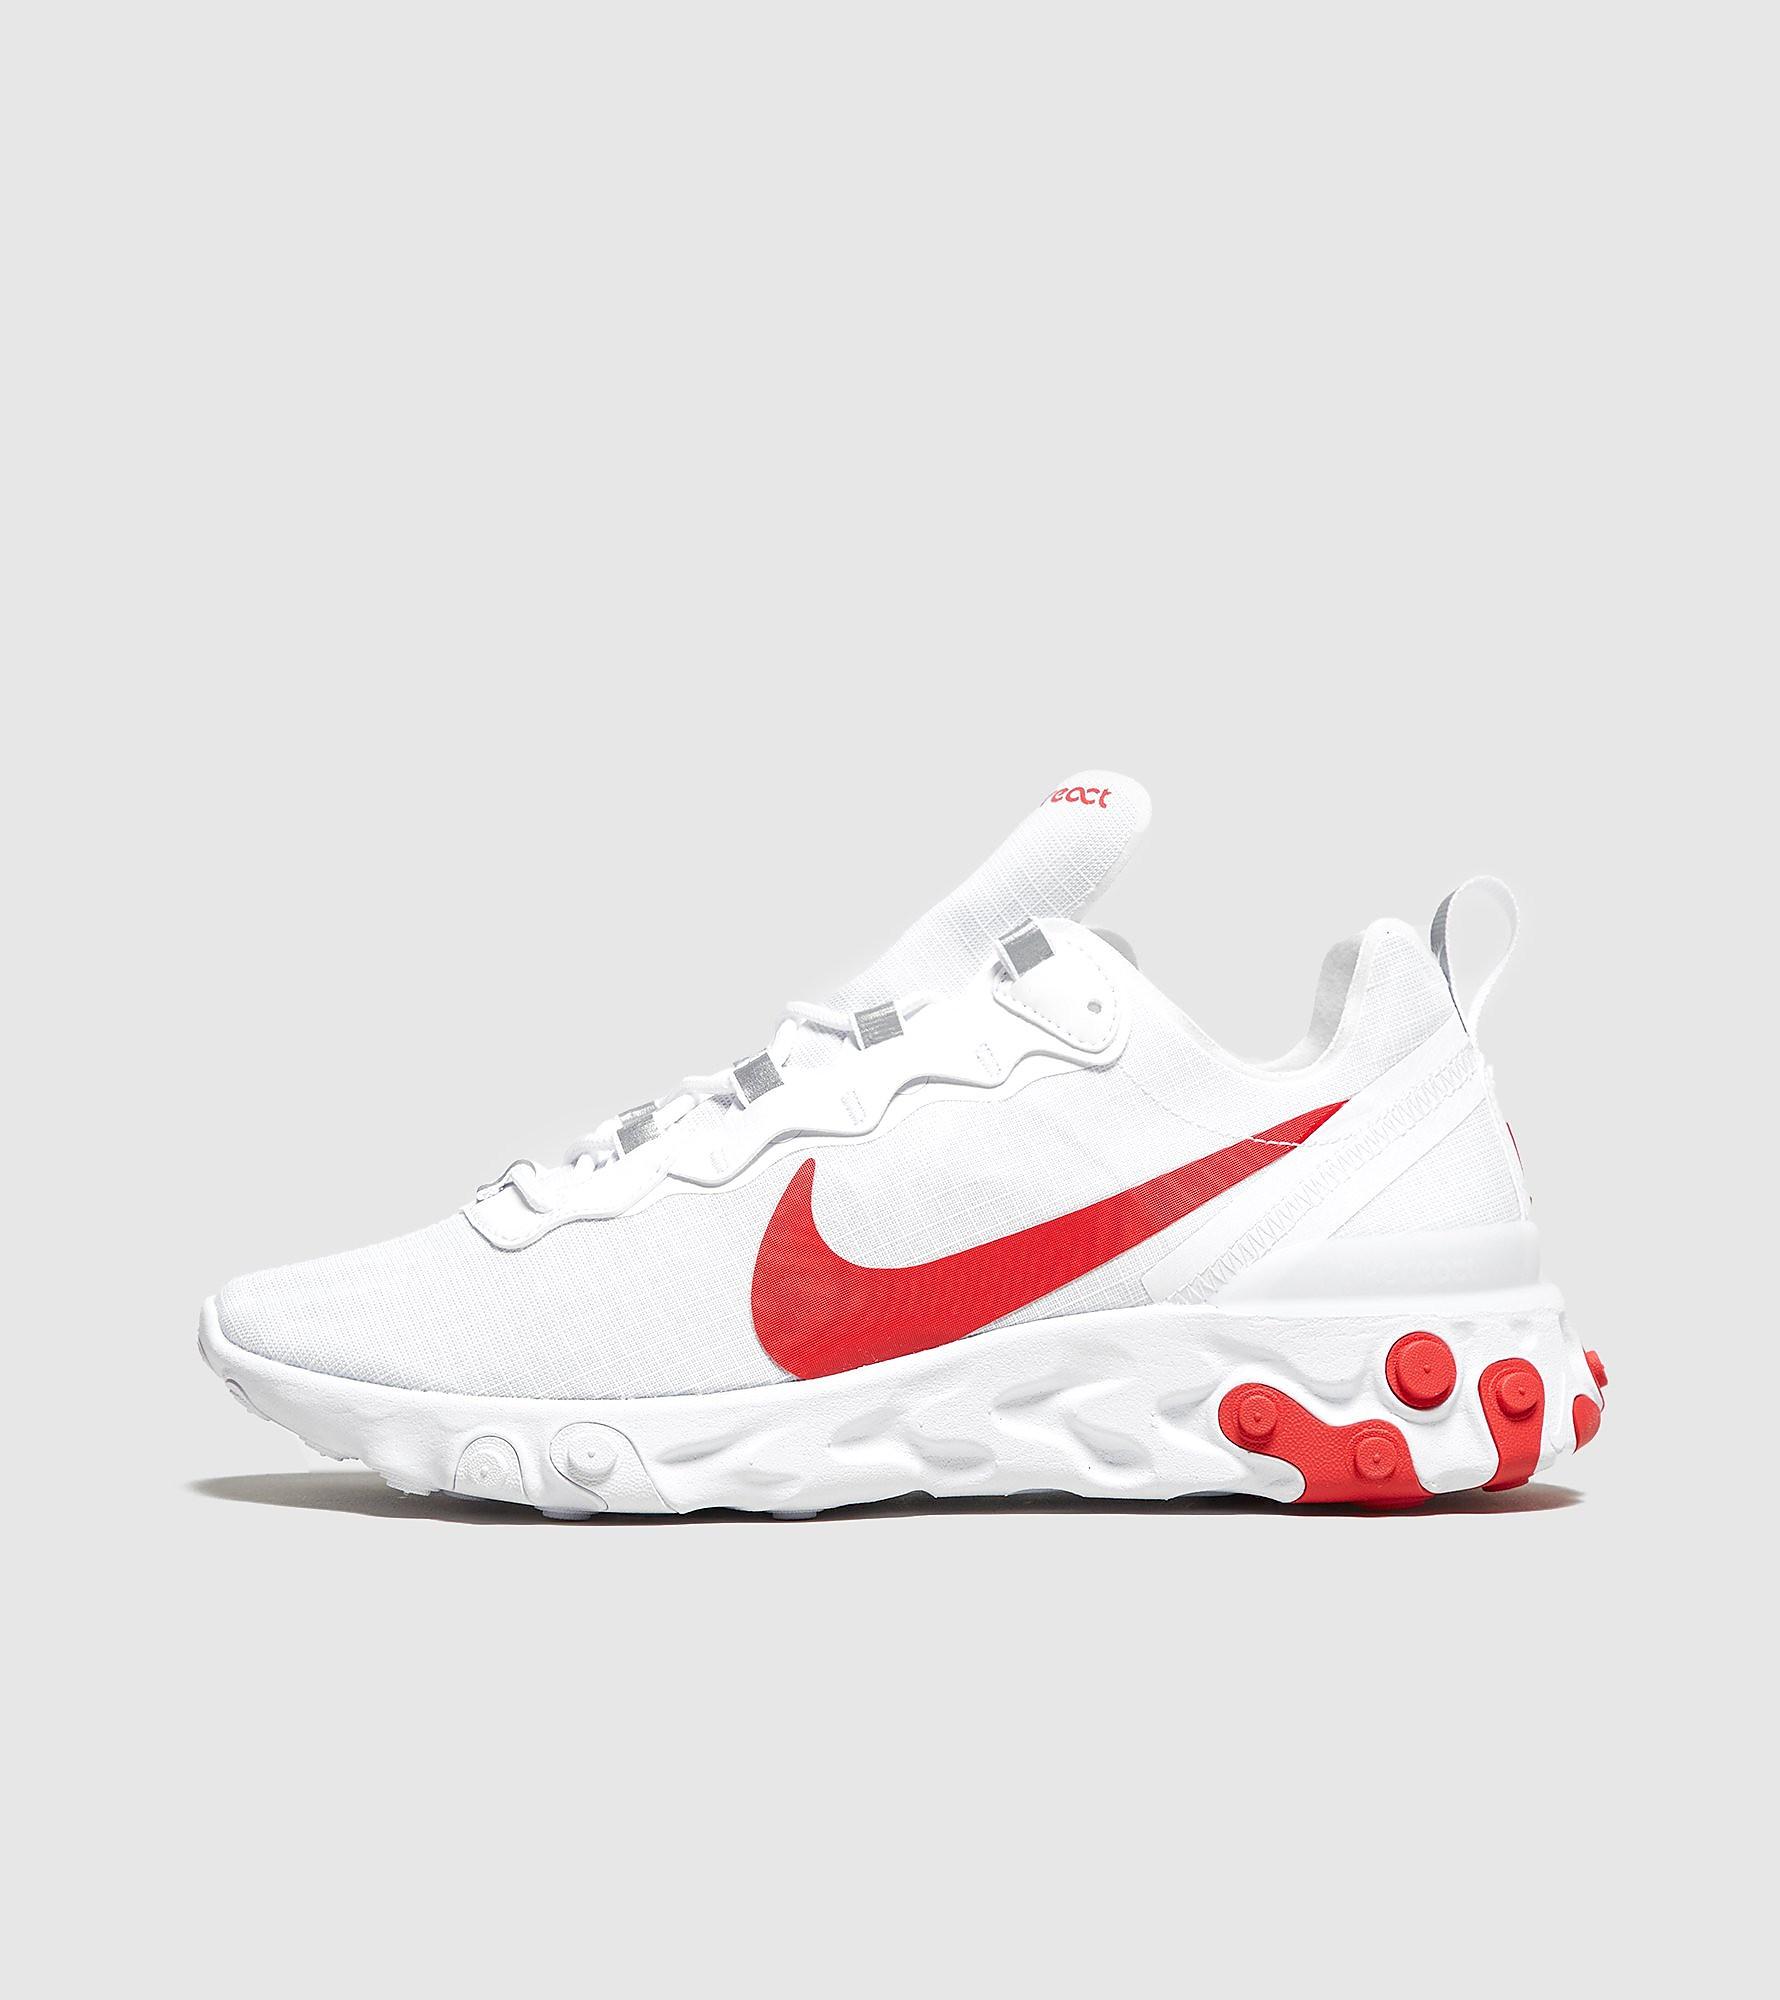 quality design 7cfa7 bf8e3 Nike - London Trend